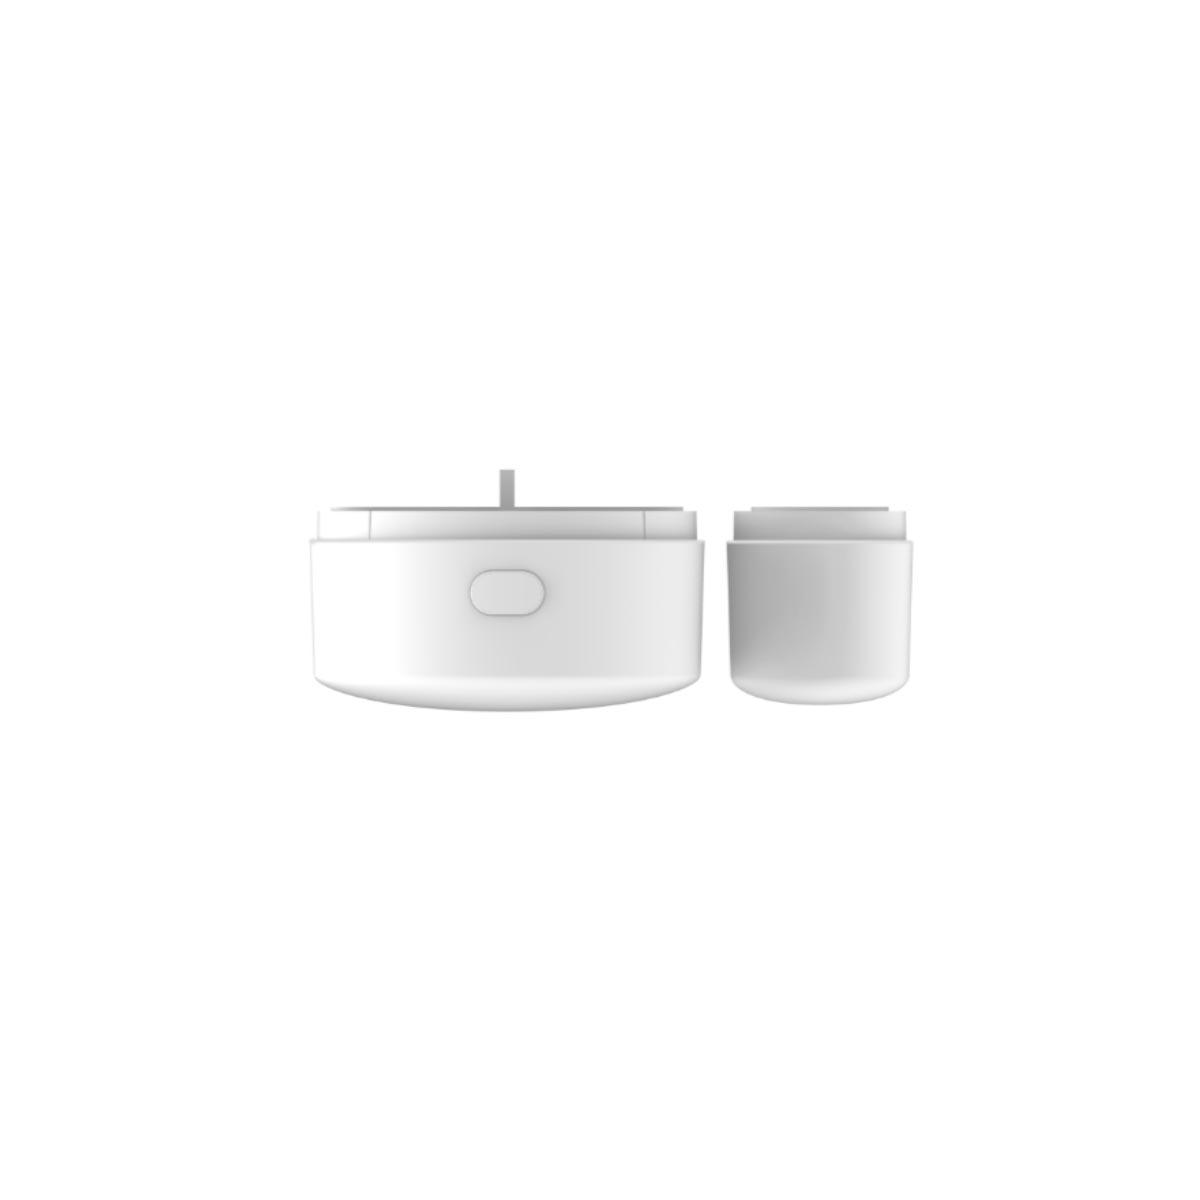 Kit 07 Sensor De Abertura Smart Intelbras Isa 1001